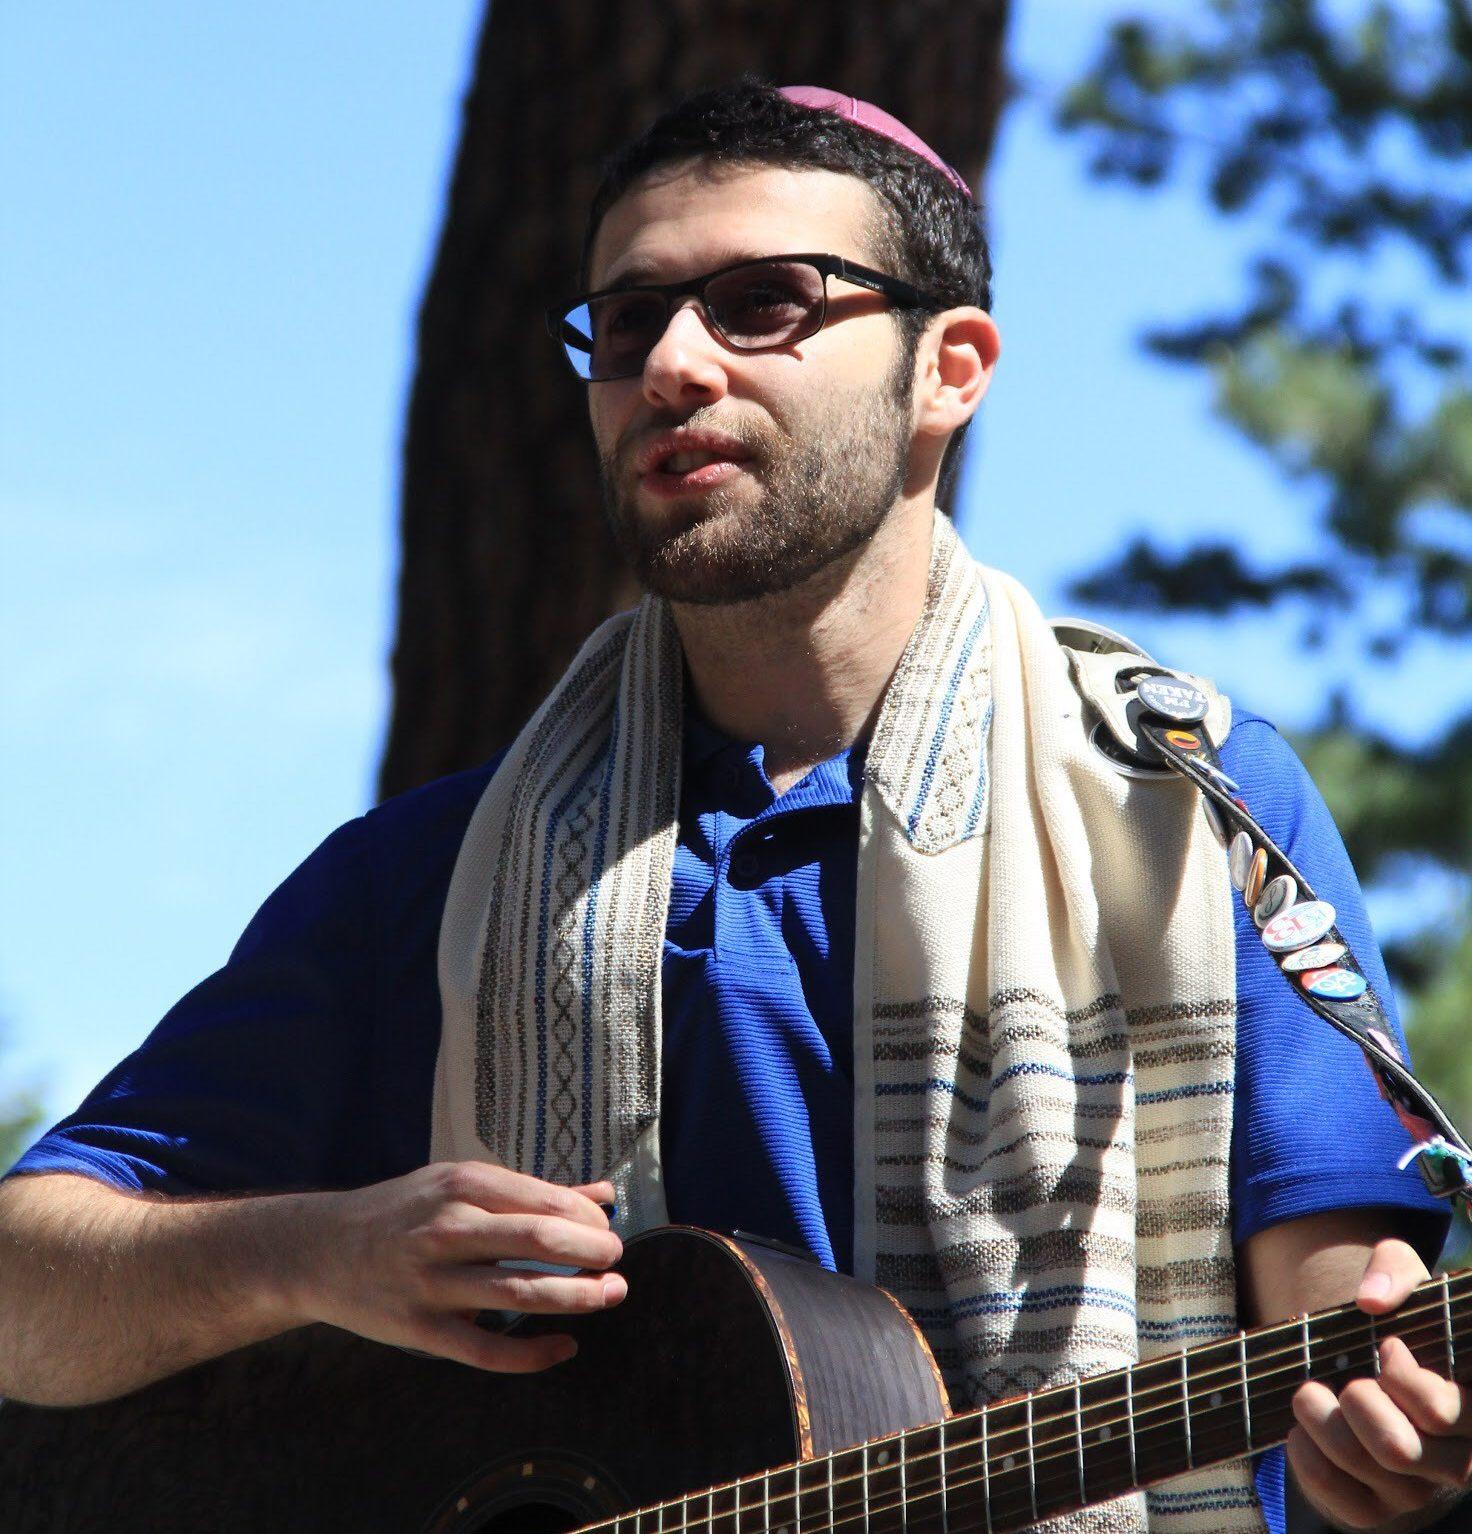 Ben Pagliaro, Cantorial Soloist